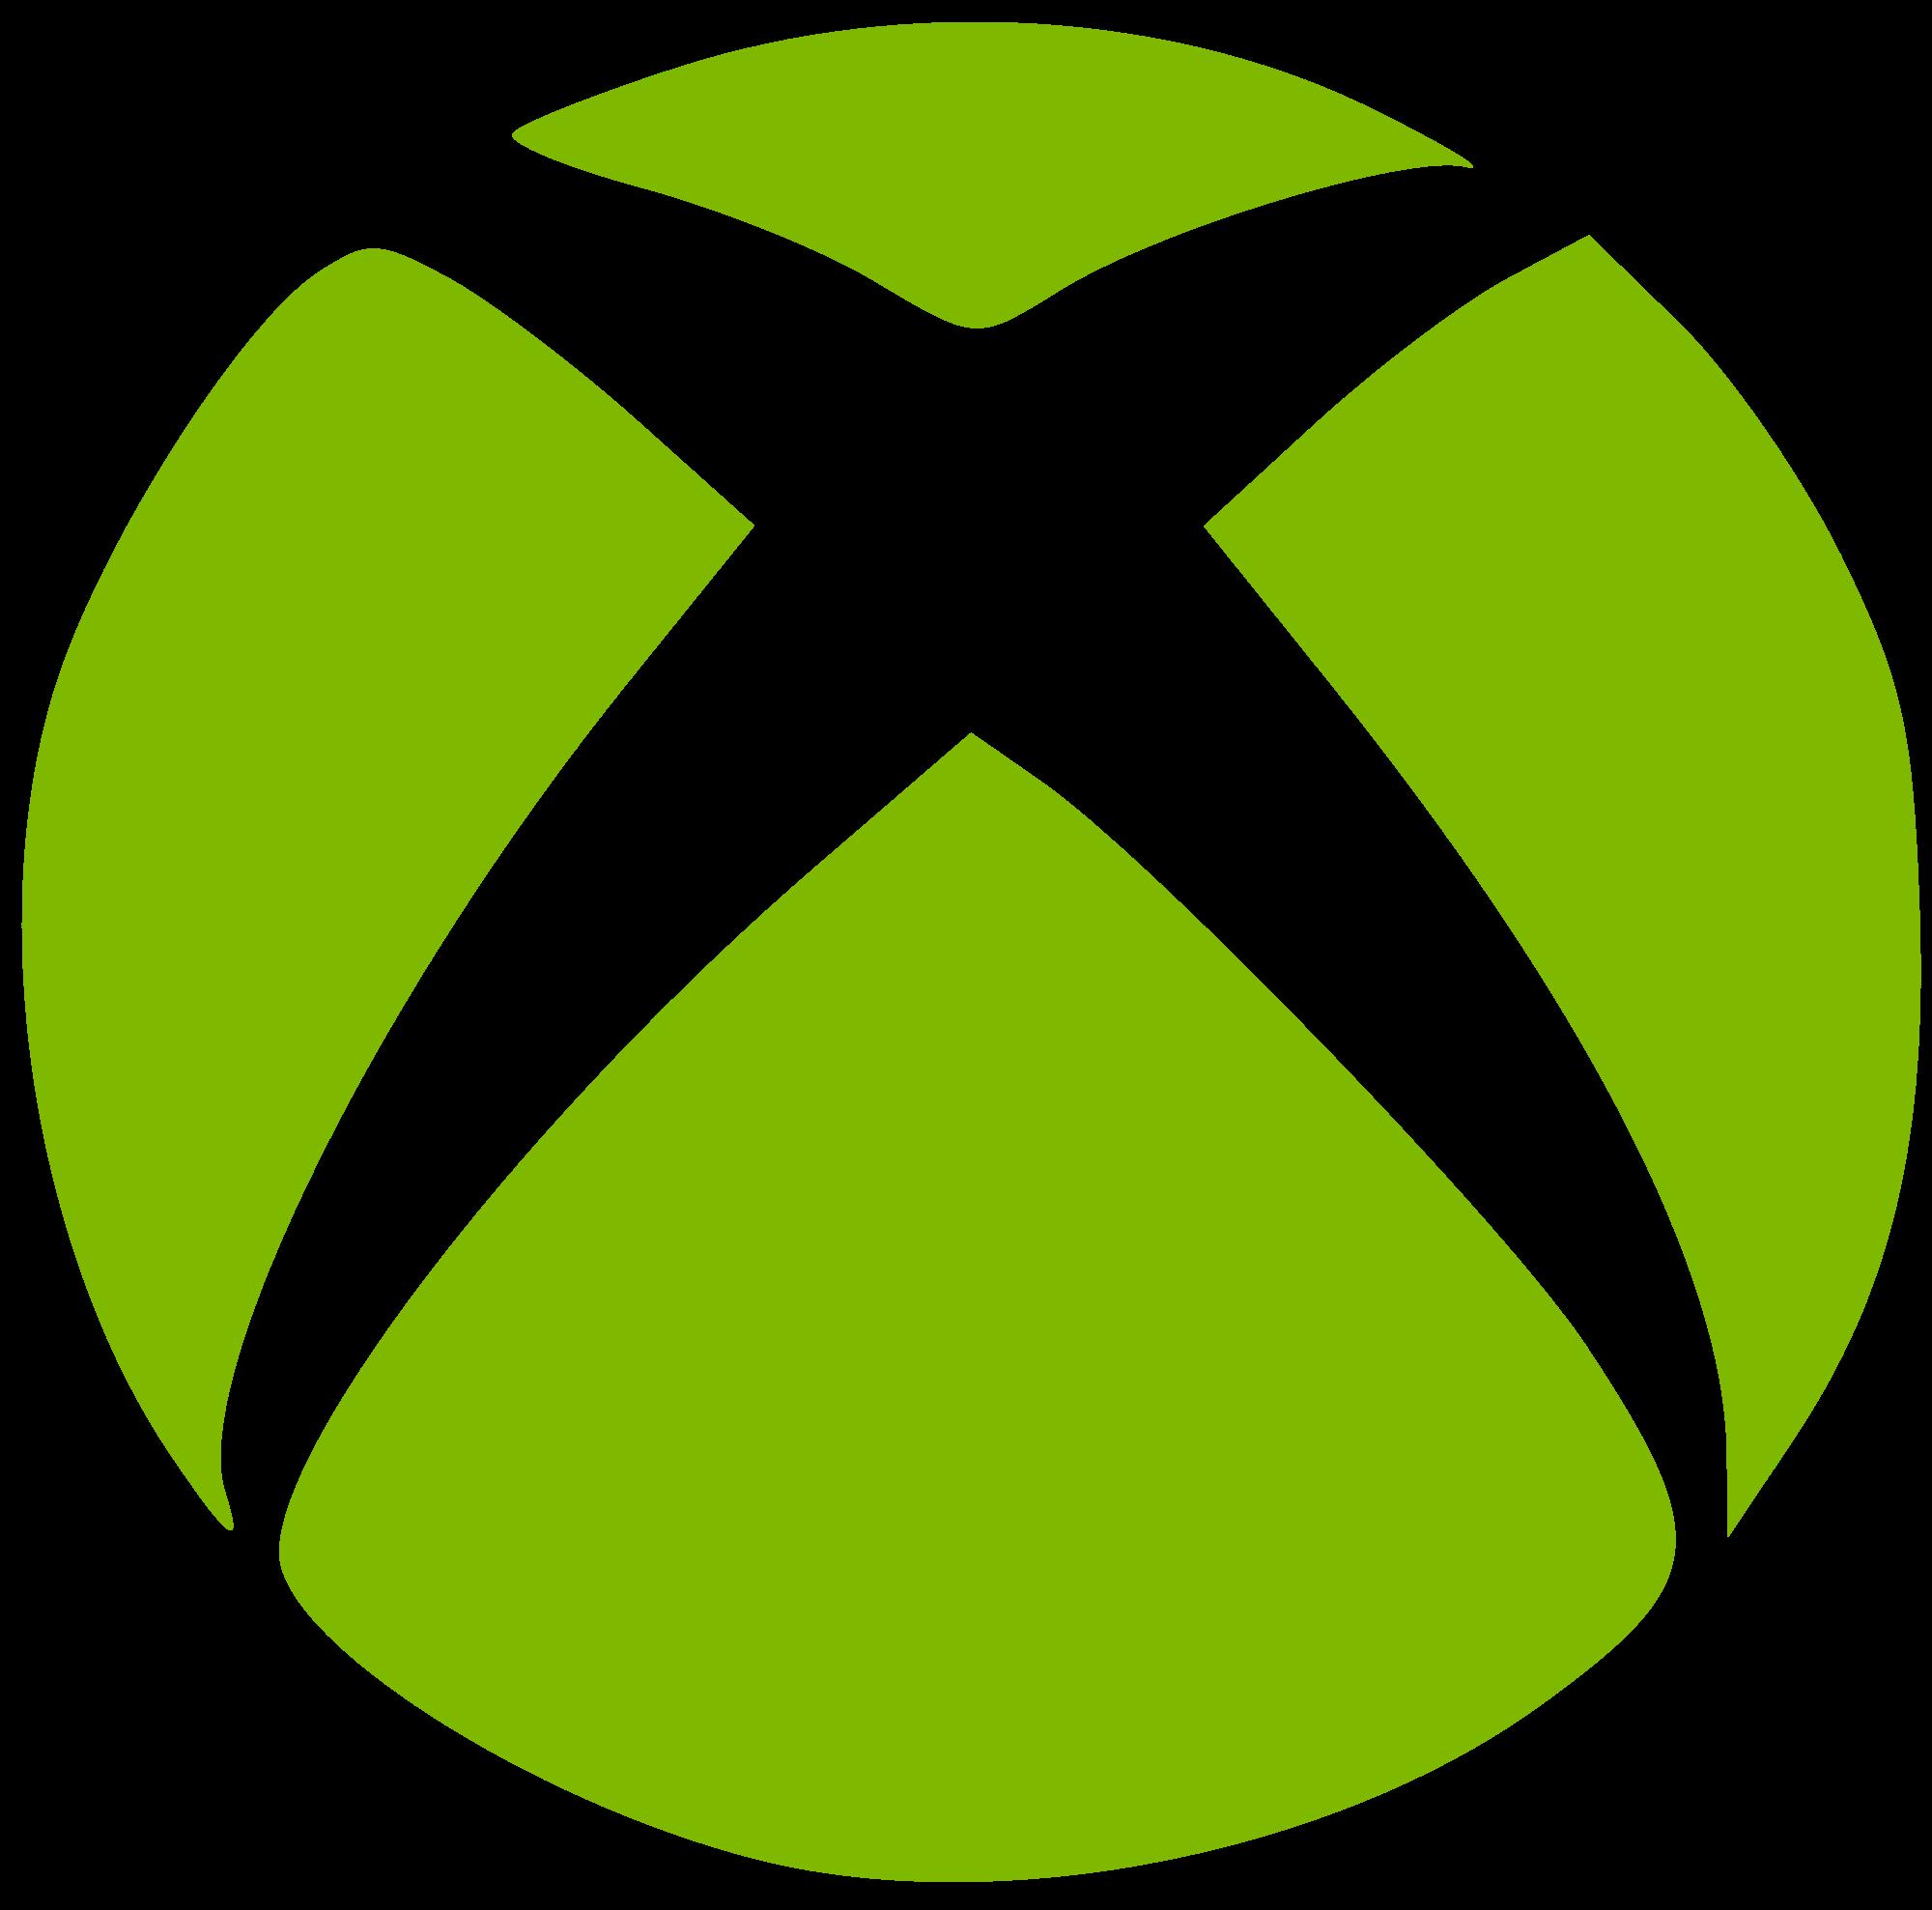 Xbox Logo PNG Image.